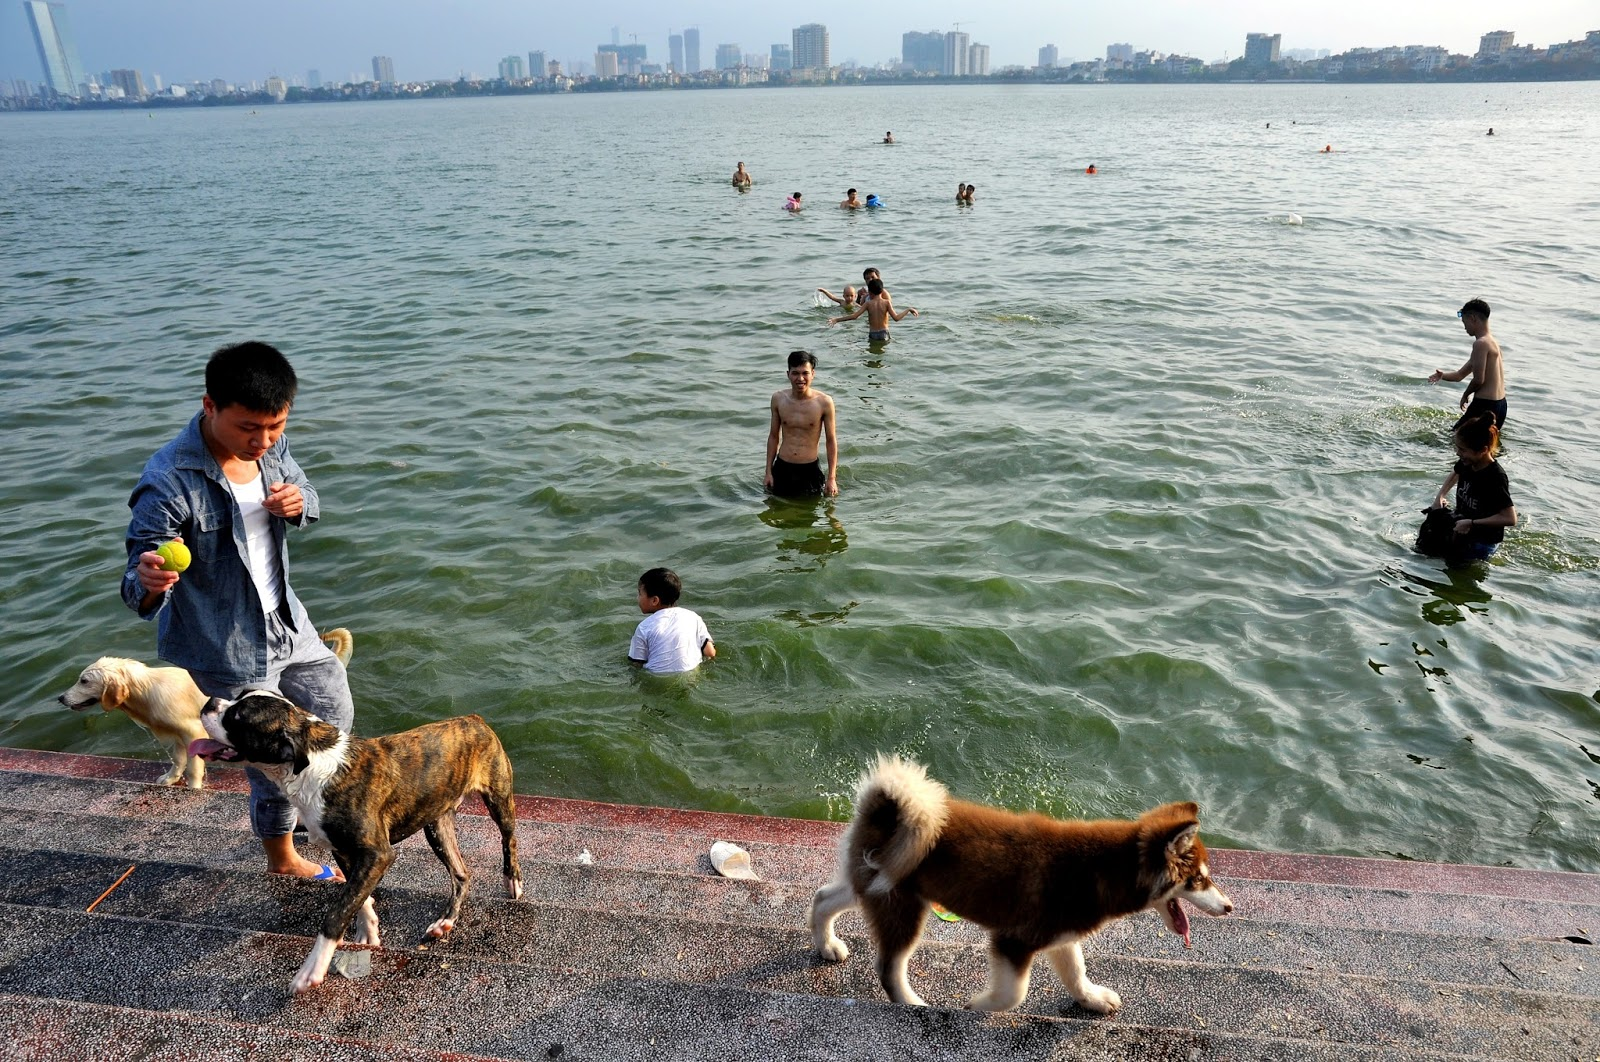 Trave to Hanoi - average temperature in Hanoi in July